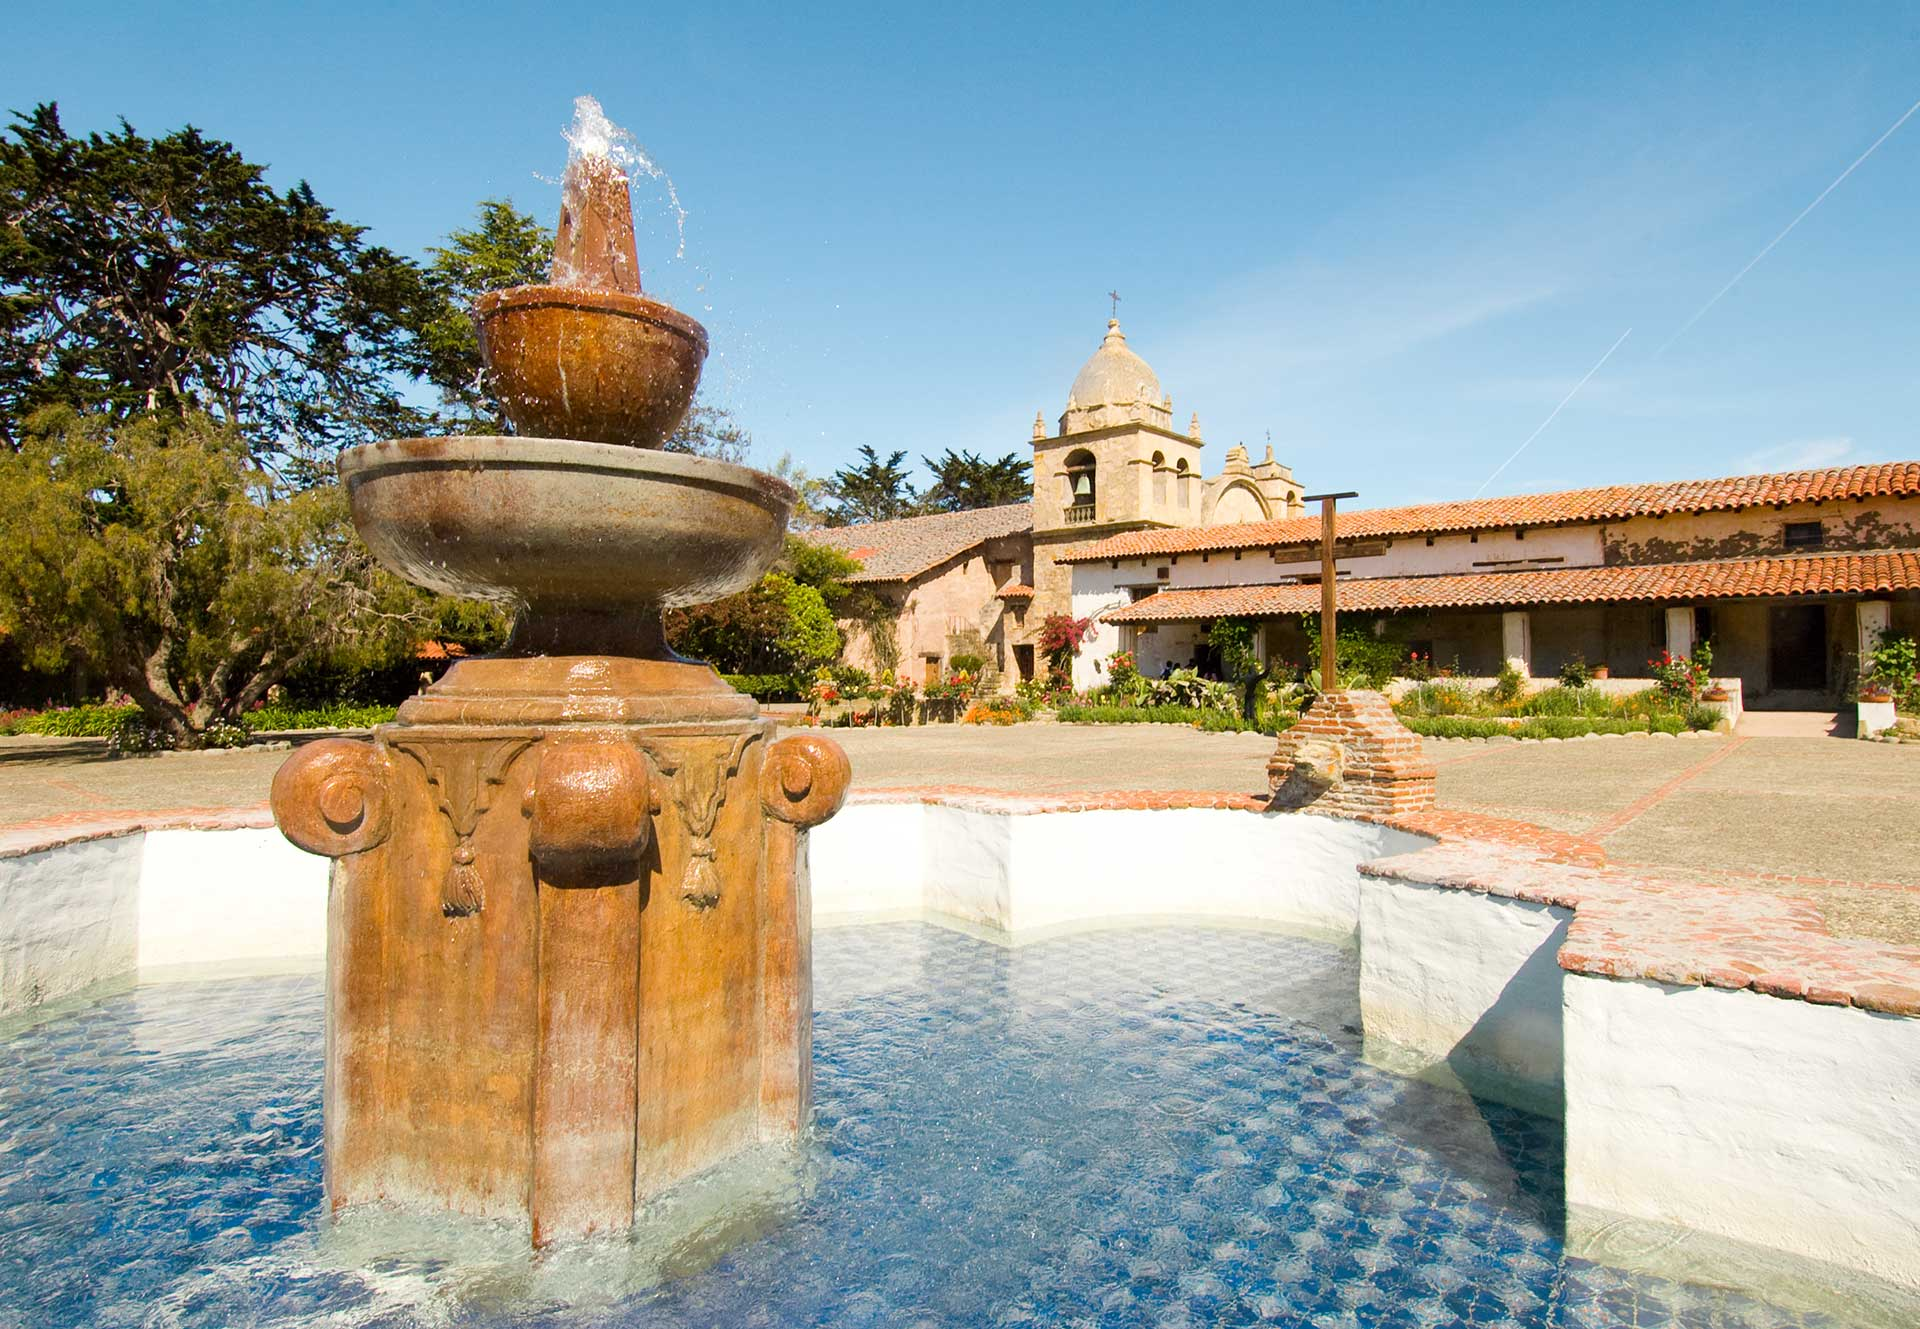 Attractions - Carmel Mission Basilica